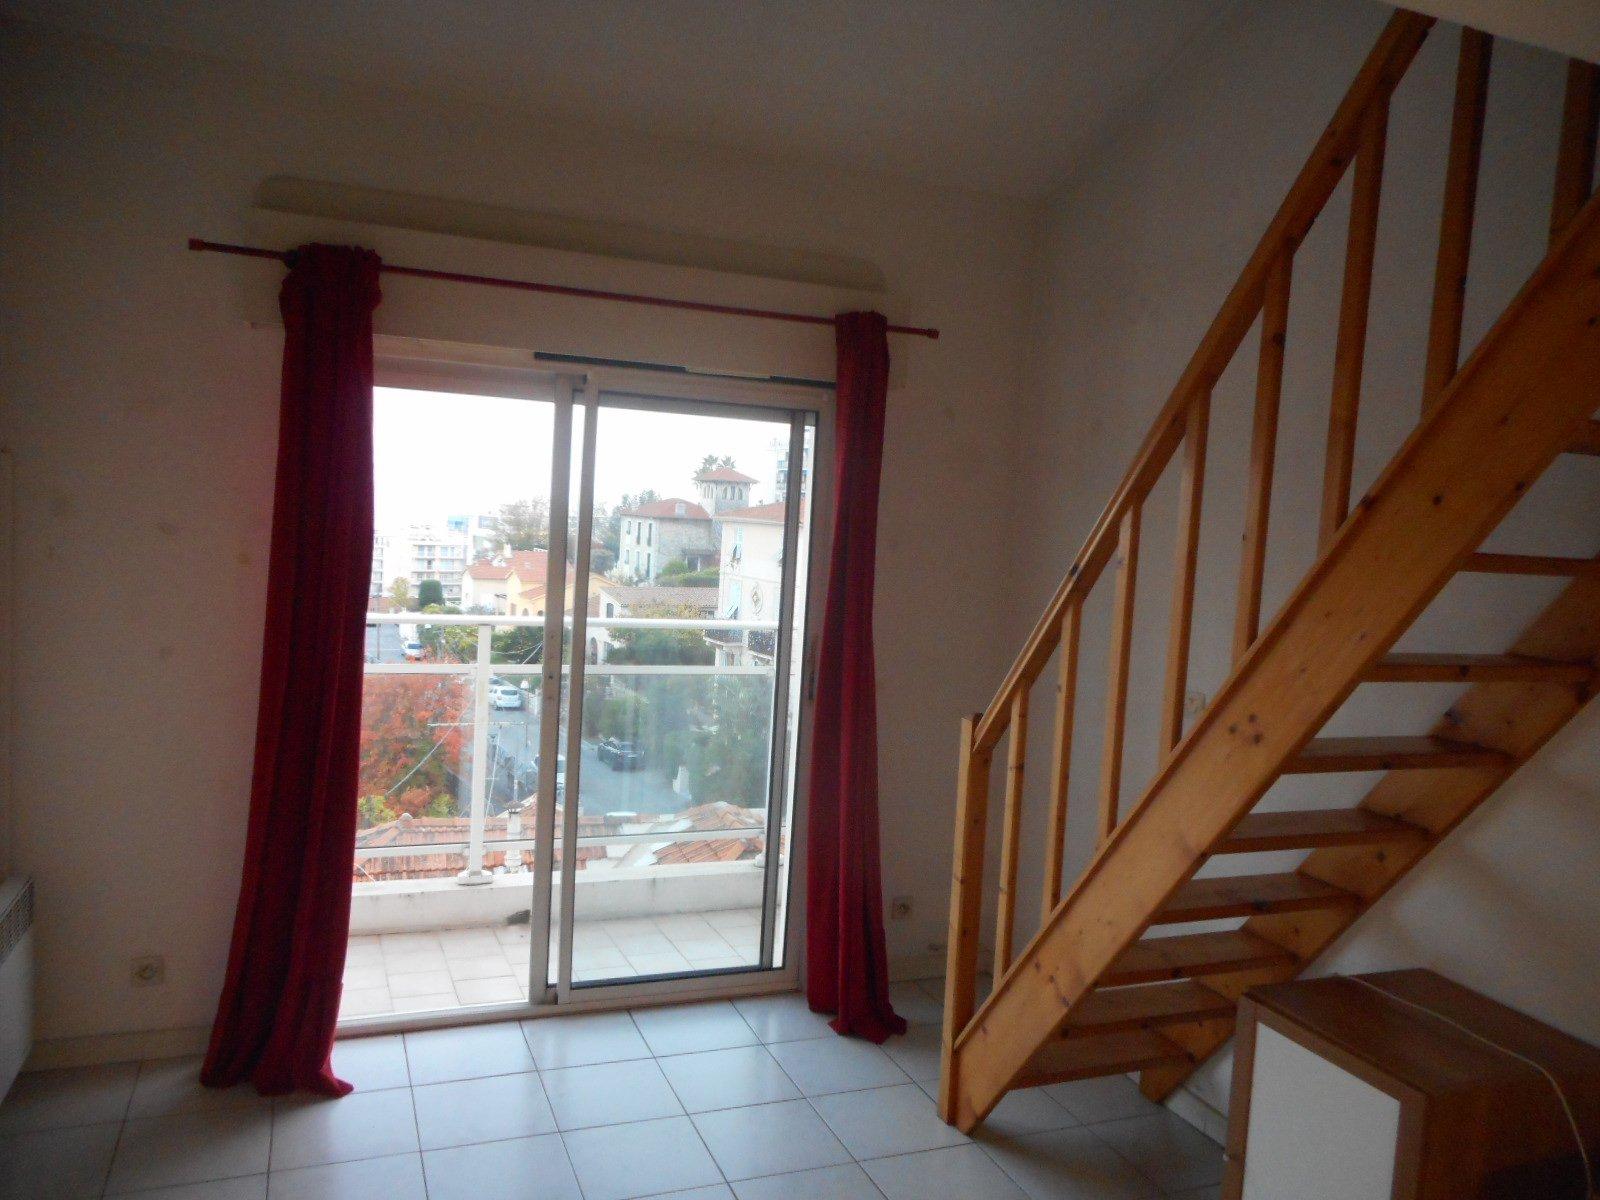 Affitto Appartamento - Nizza (Nice) Fac de Lettres